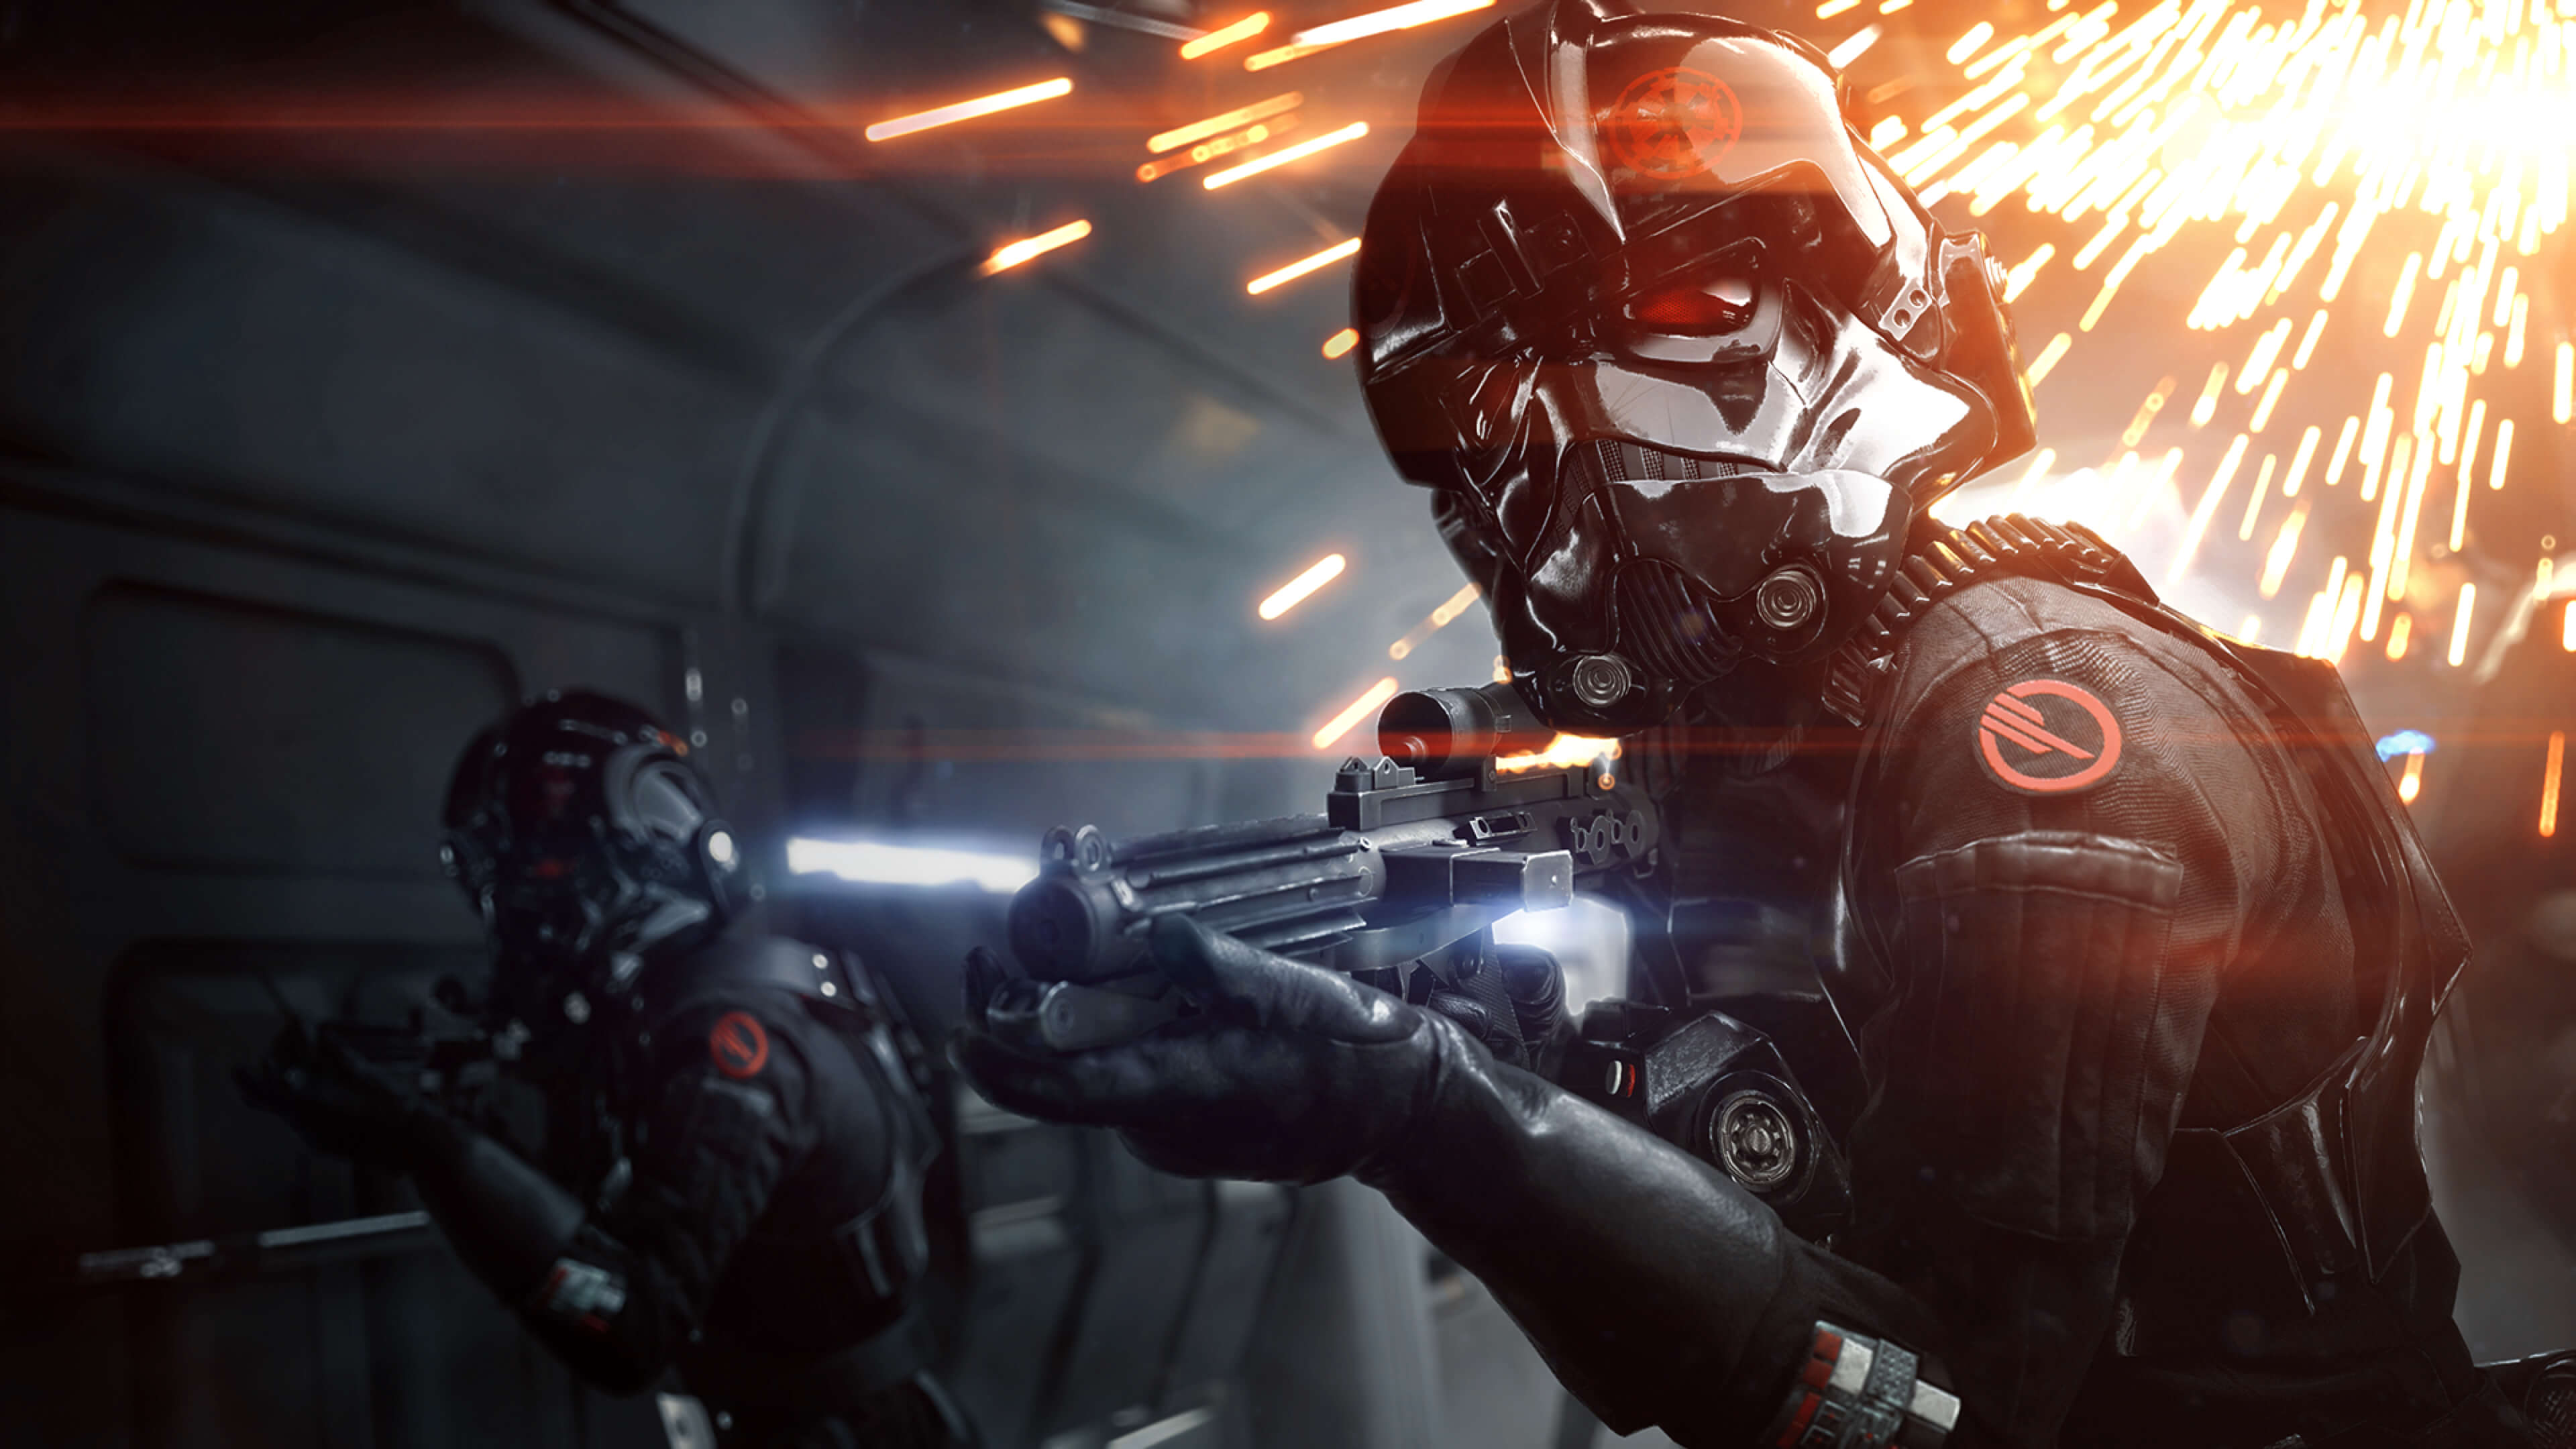 Star Wars Ea Battlefront 2 Wallpaper Hd Hi Res 31 Milners Blog